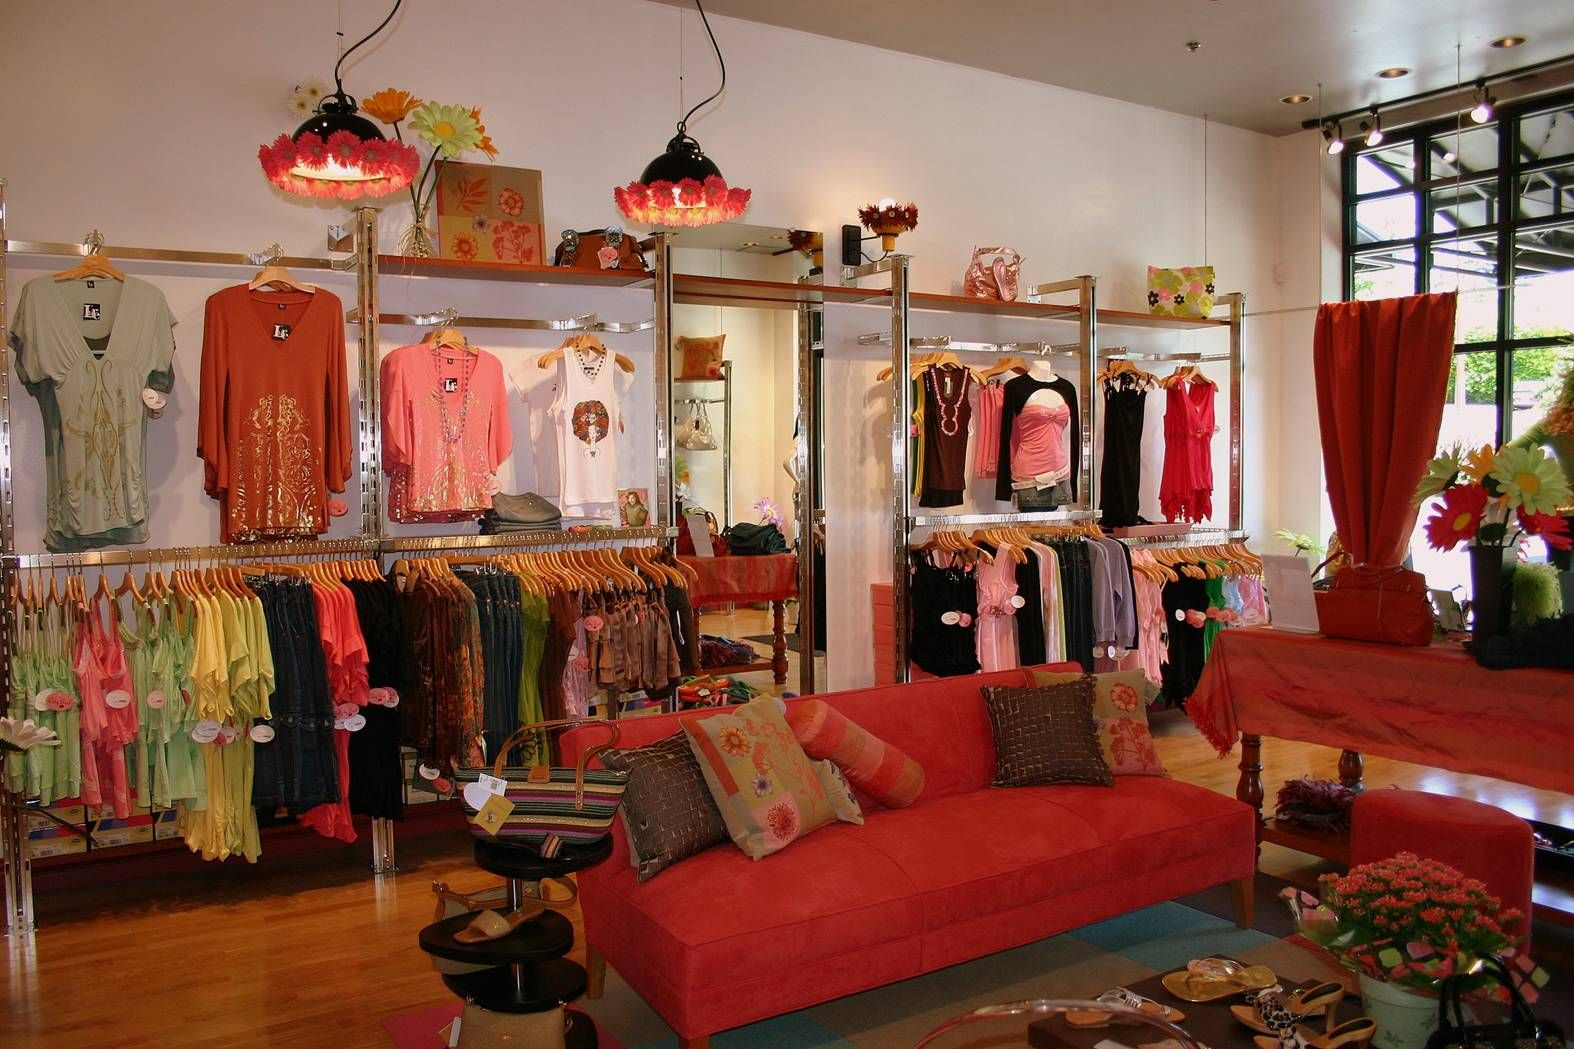 Mititique Boutique: Fashion Boutique Interior With Modern ...